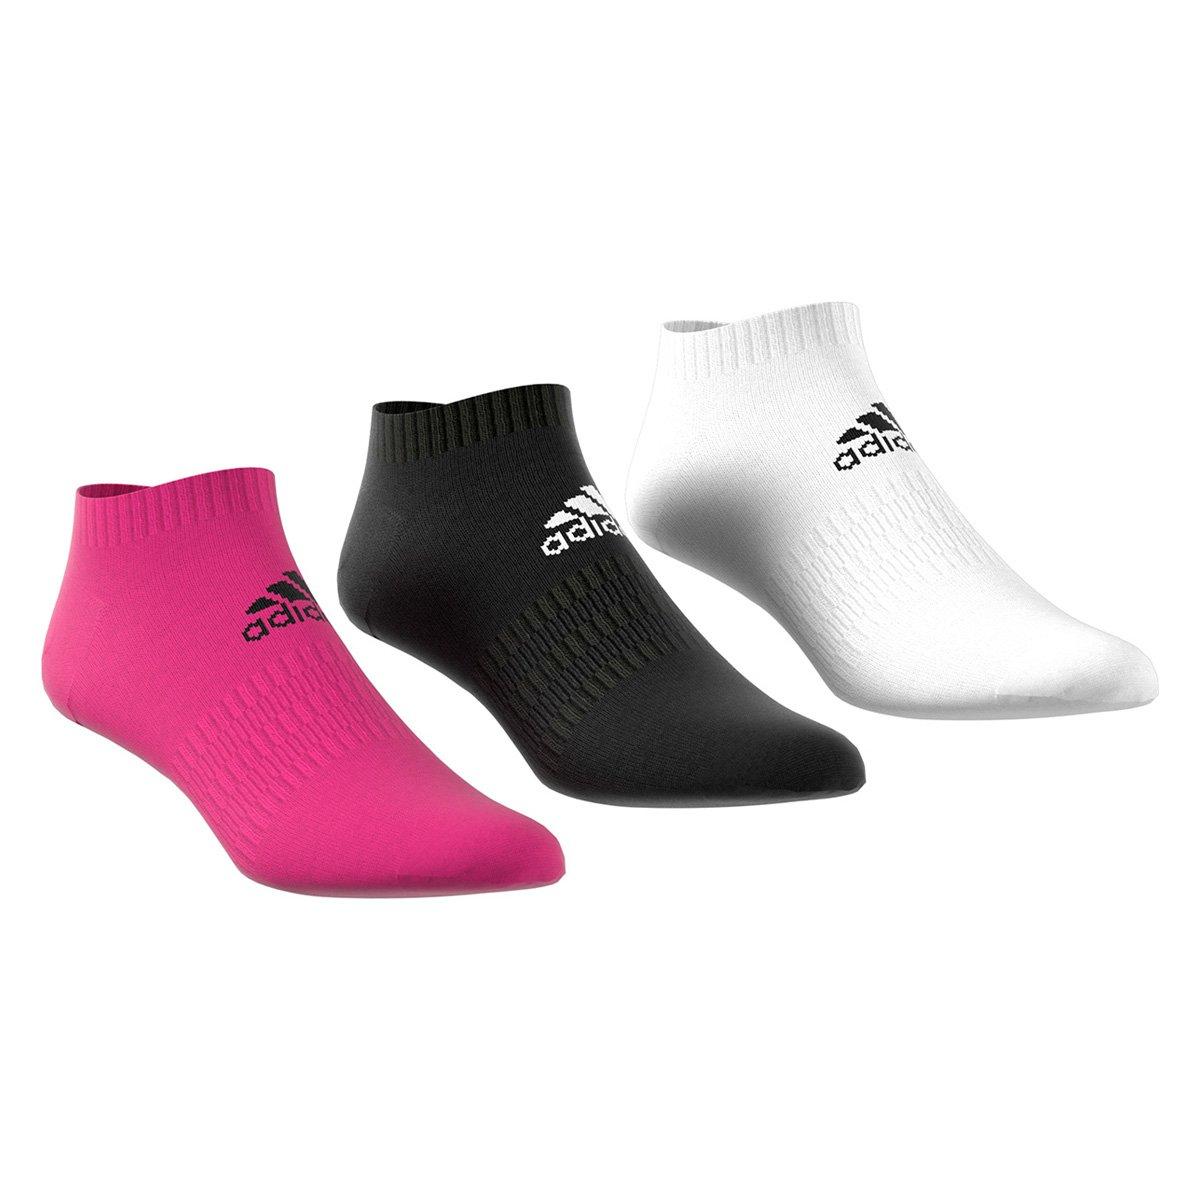 Kit Meia Adidas Soquete Cush Low c/ 3 pares - Tam: 38/40 - 1